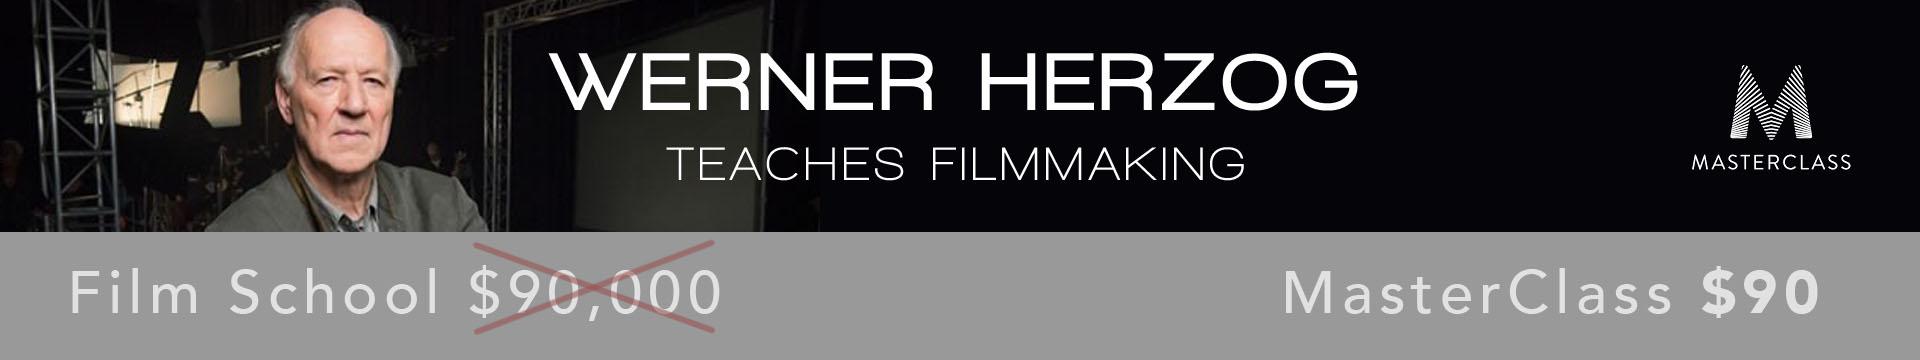 Master Class Banner Herzog